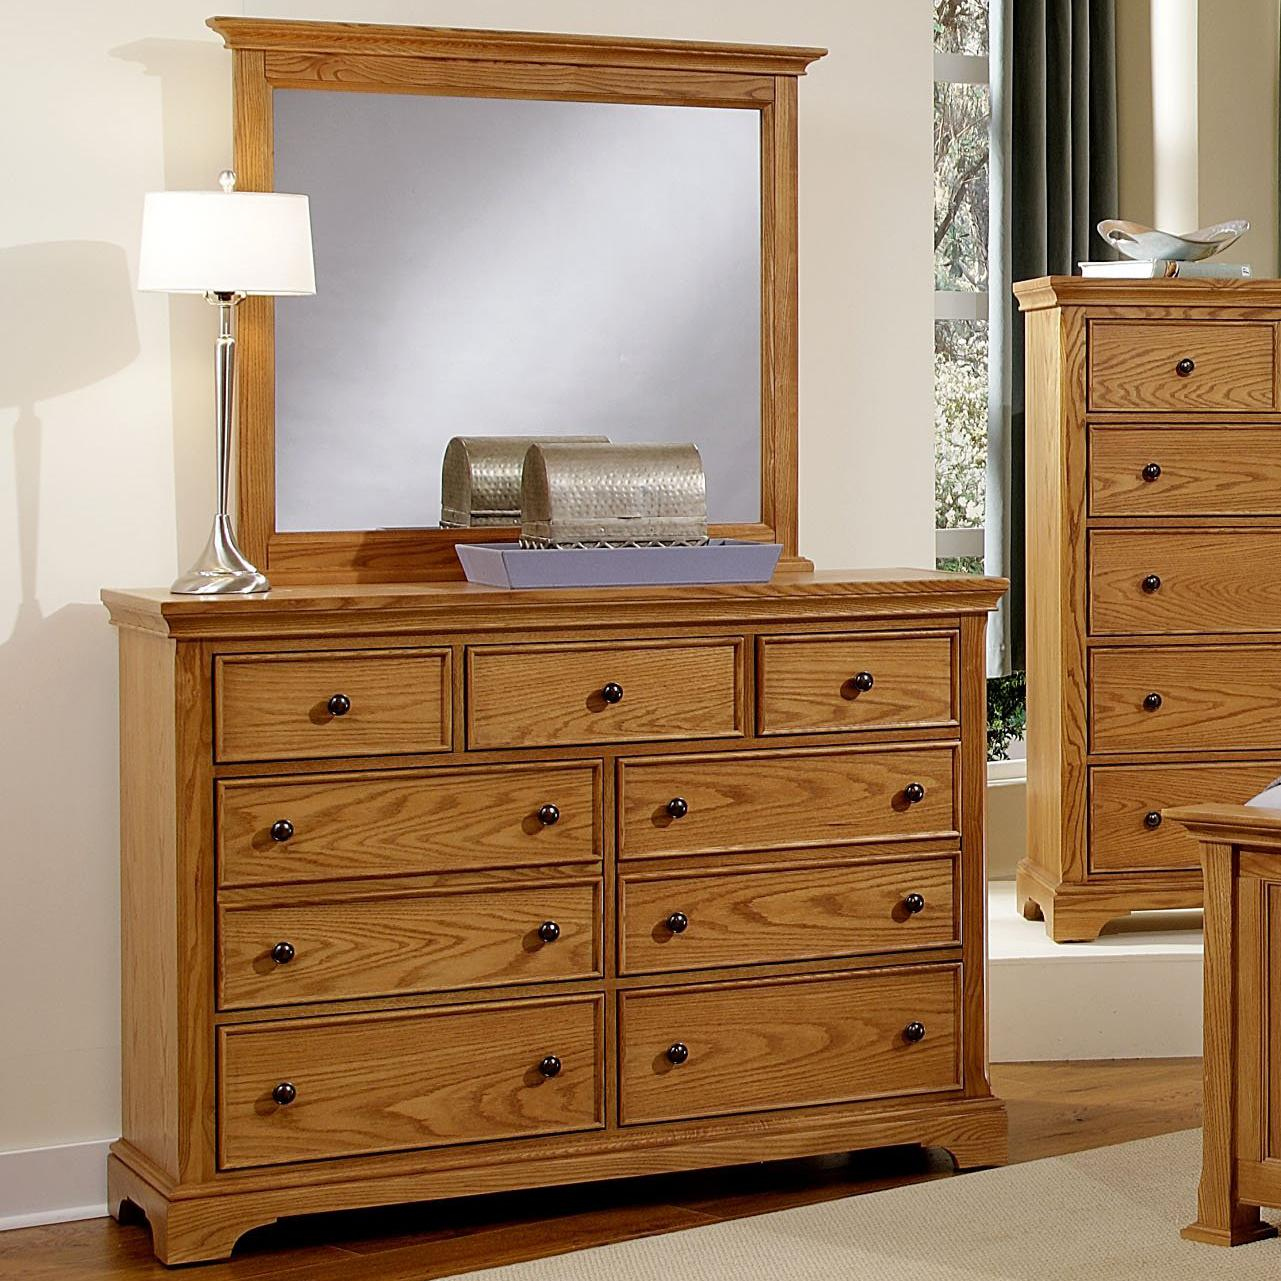 Vaughan Bassett Forsyth 7 Drawer Dresser and Mirror - Item Number: BB75-002+446